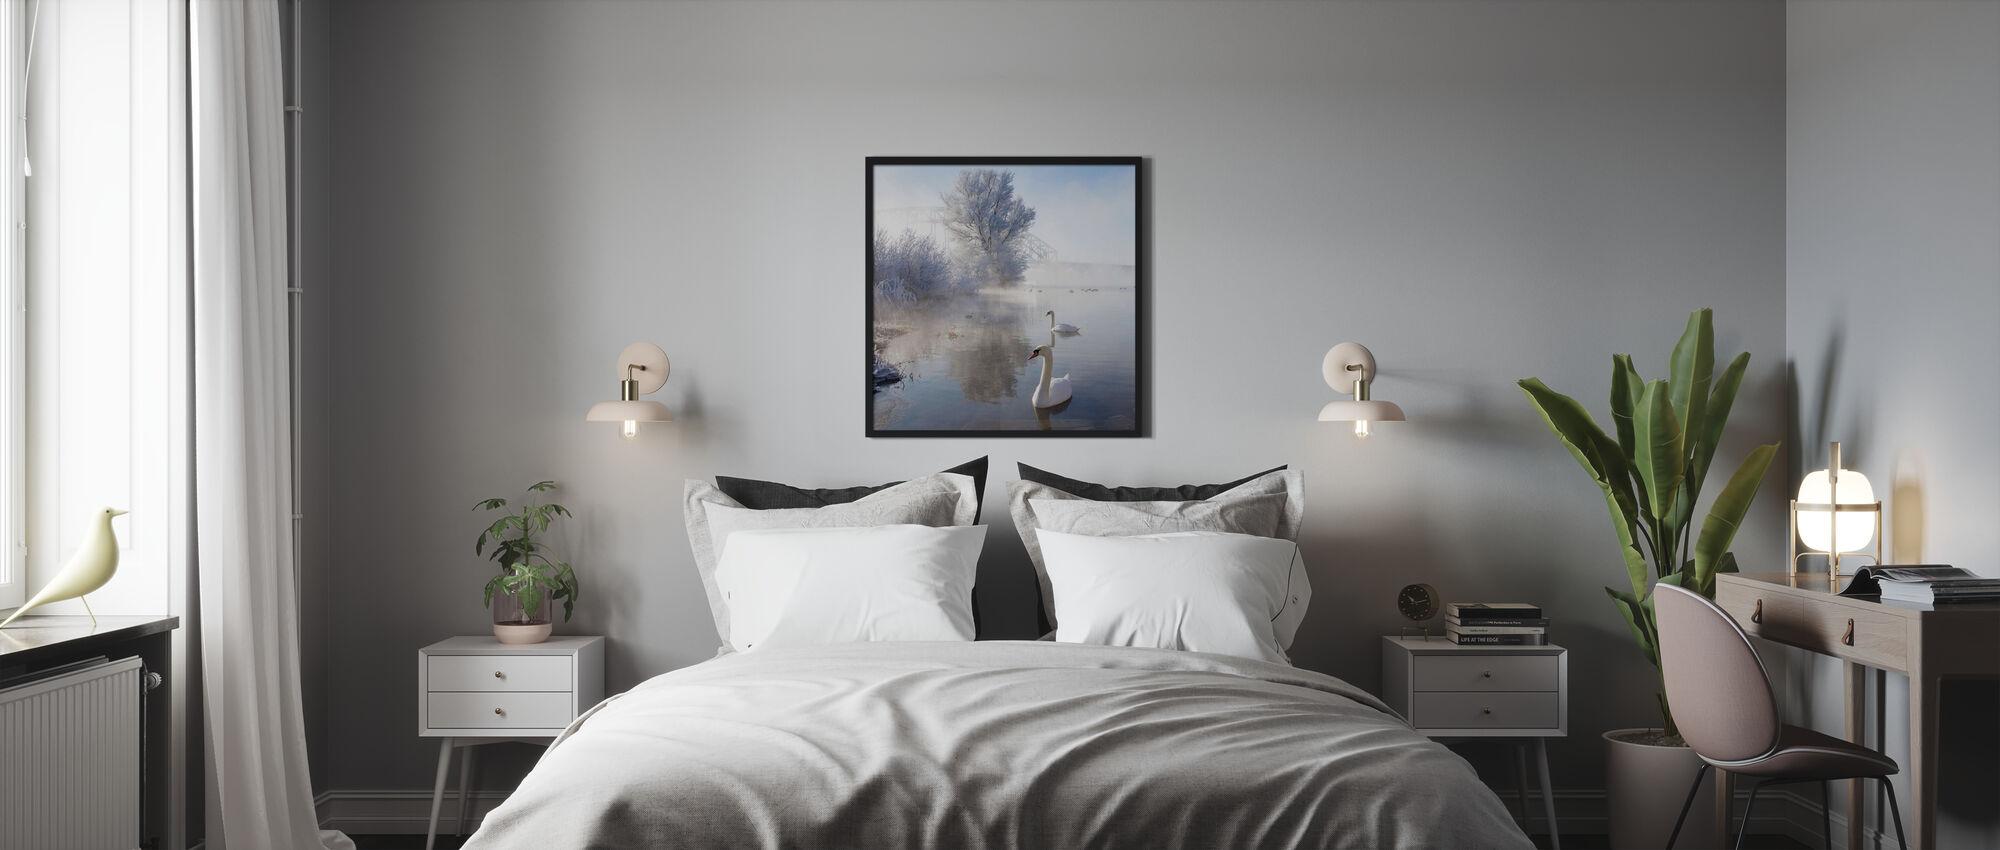 Icy Swan Lake - Poster - Bedroom